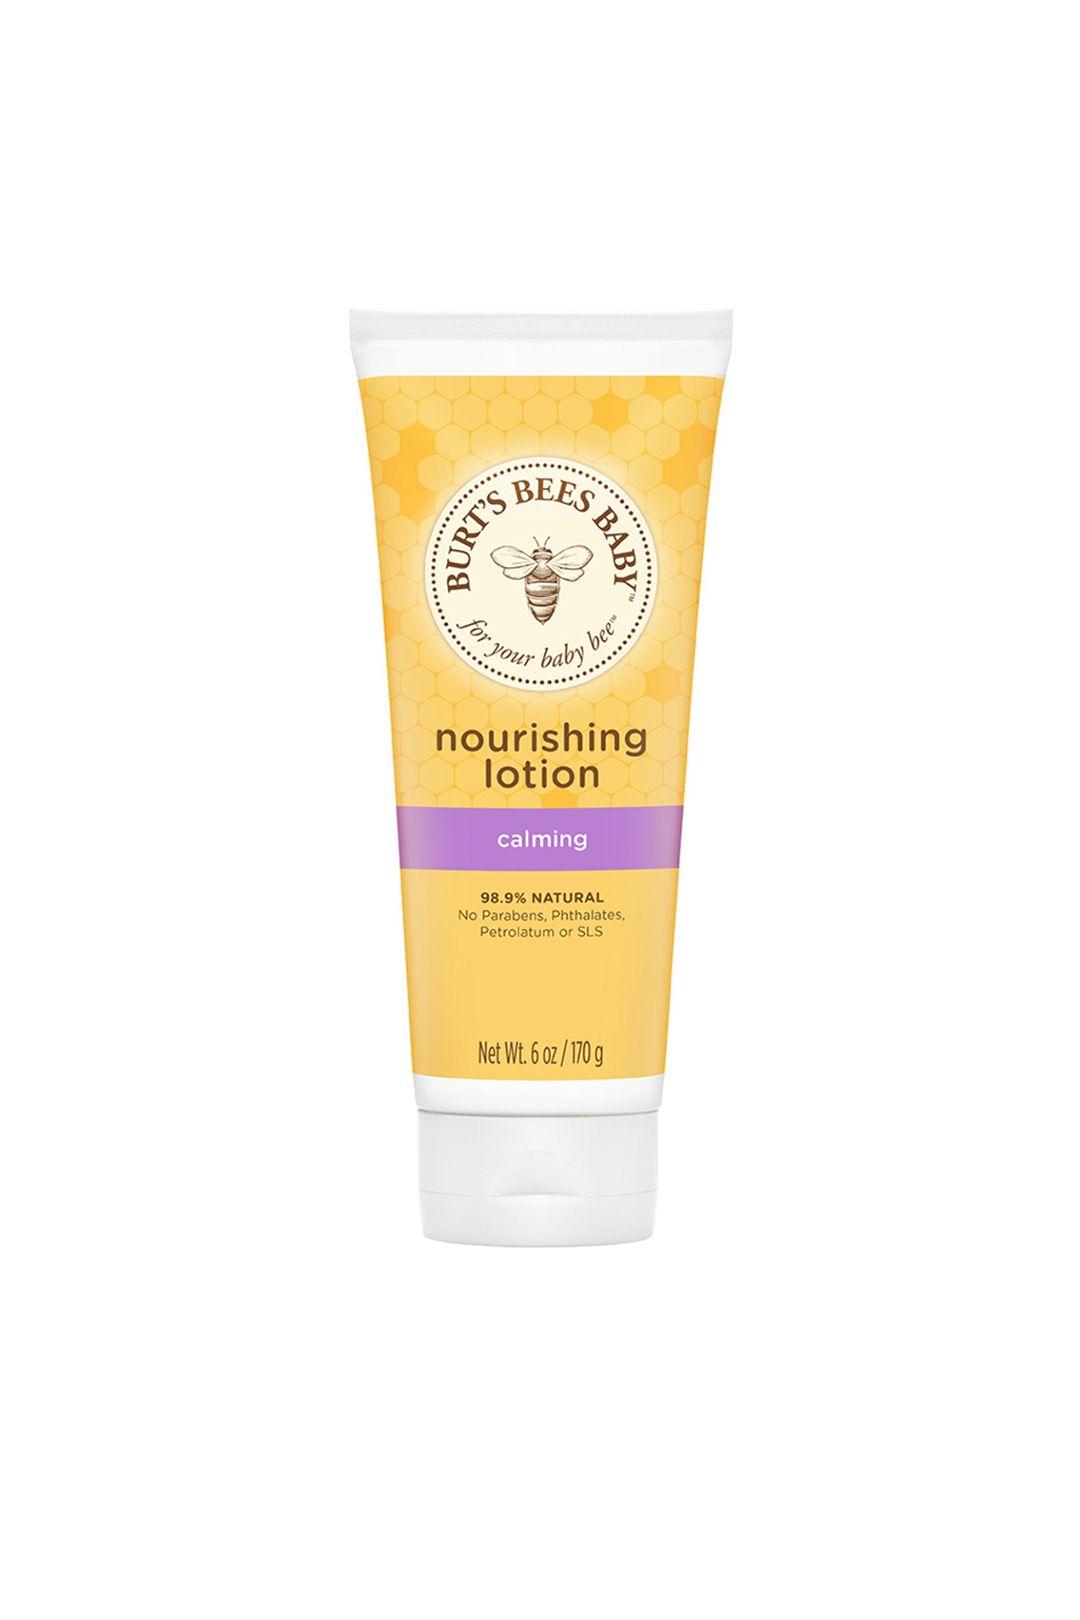 burts-bees-baby-bee-nourishing-lotion-calming